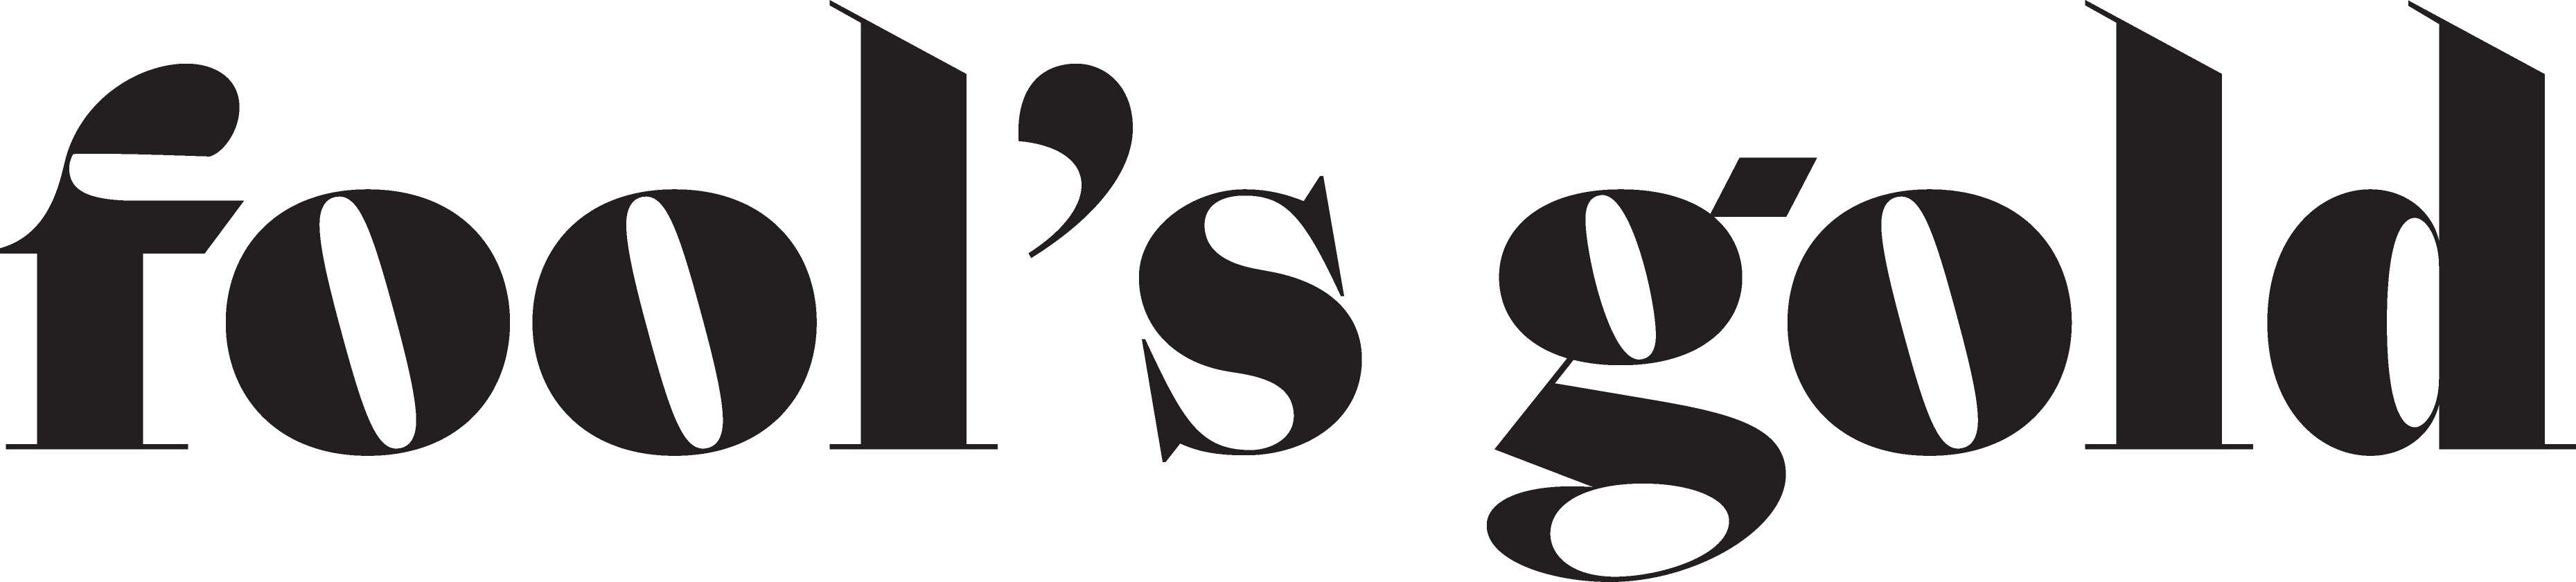 fool's gold logo - meredith christine